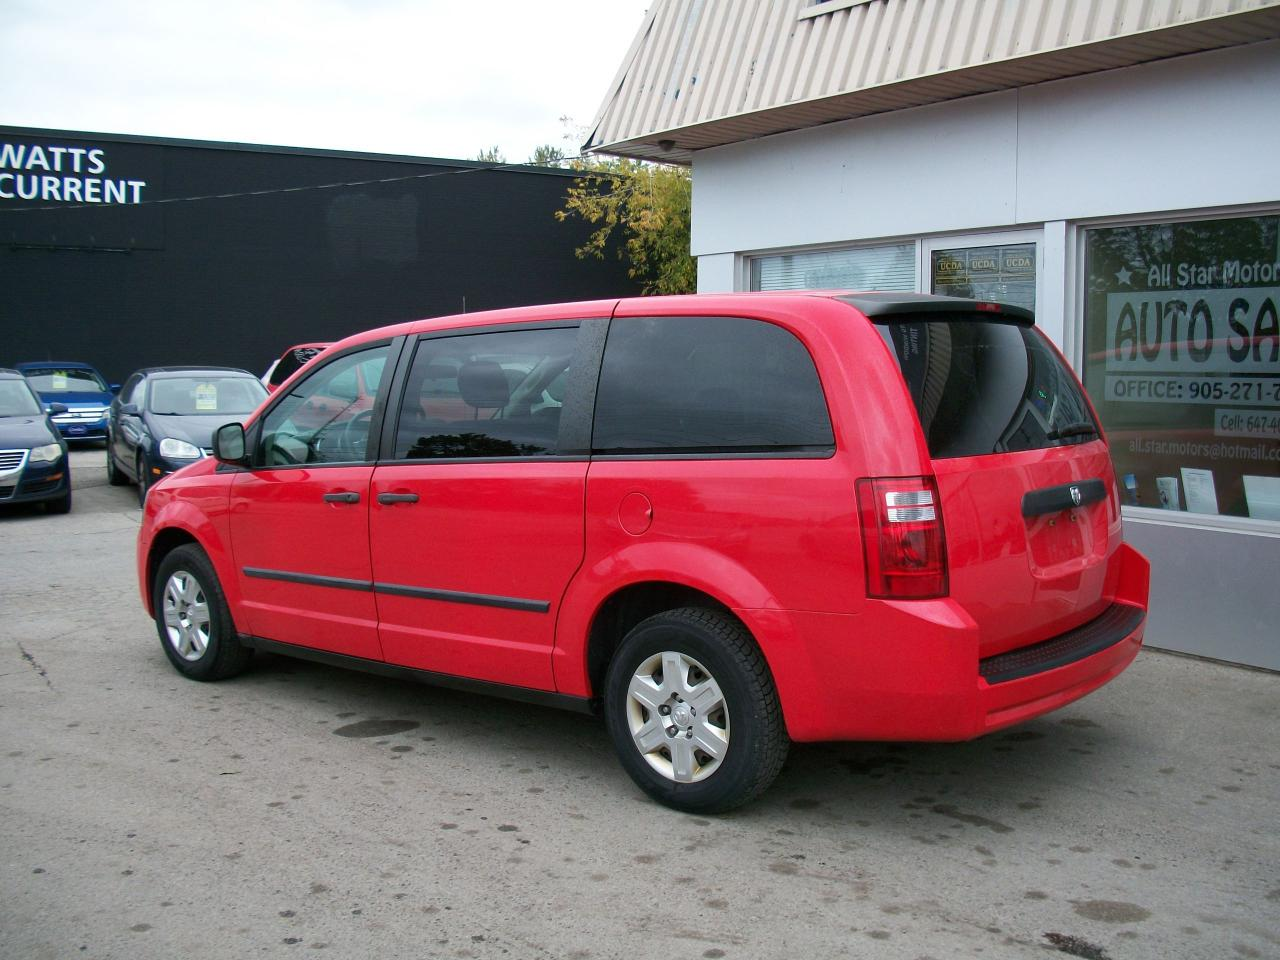 2009 Dodge Grand Caravan 7 PASSENGERS,SUPER LOW KM